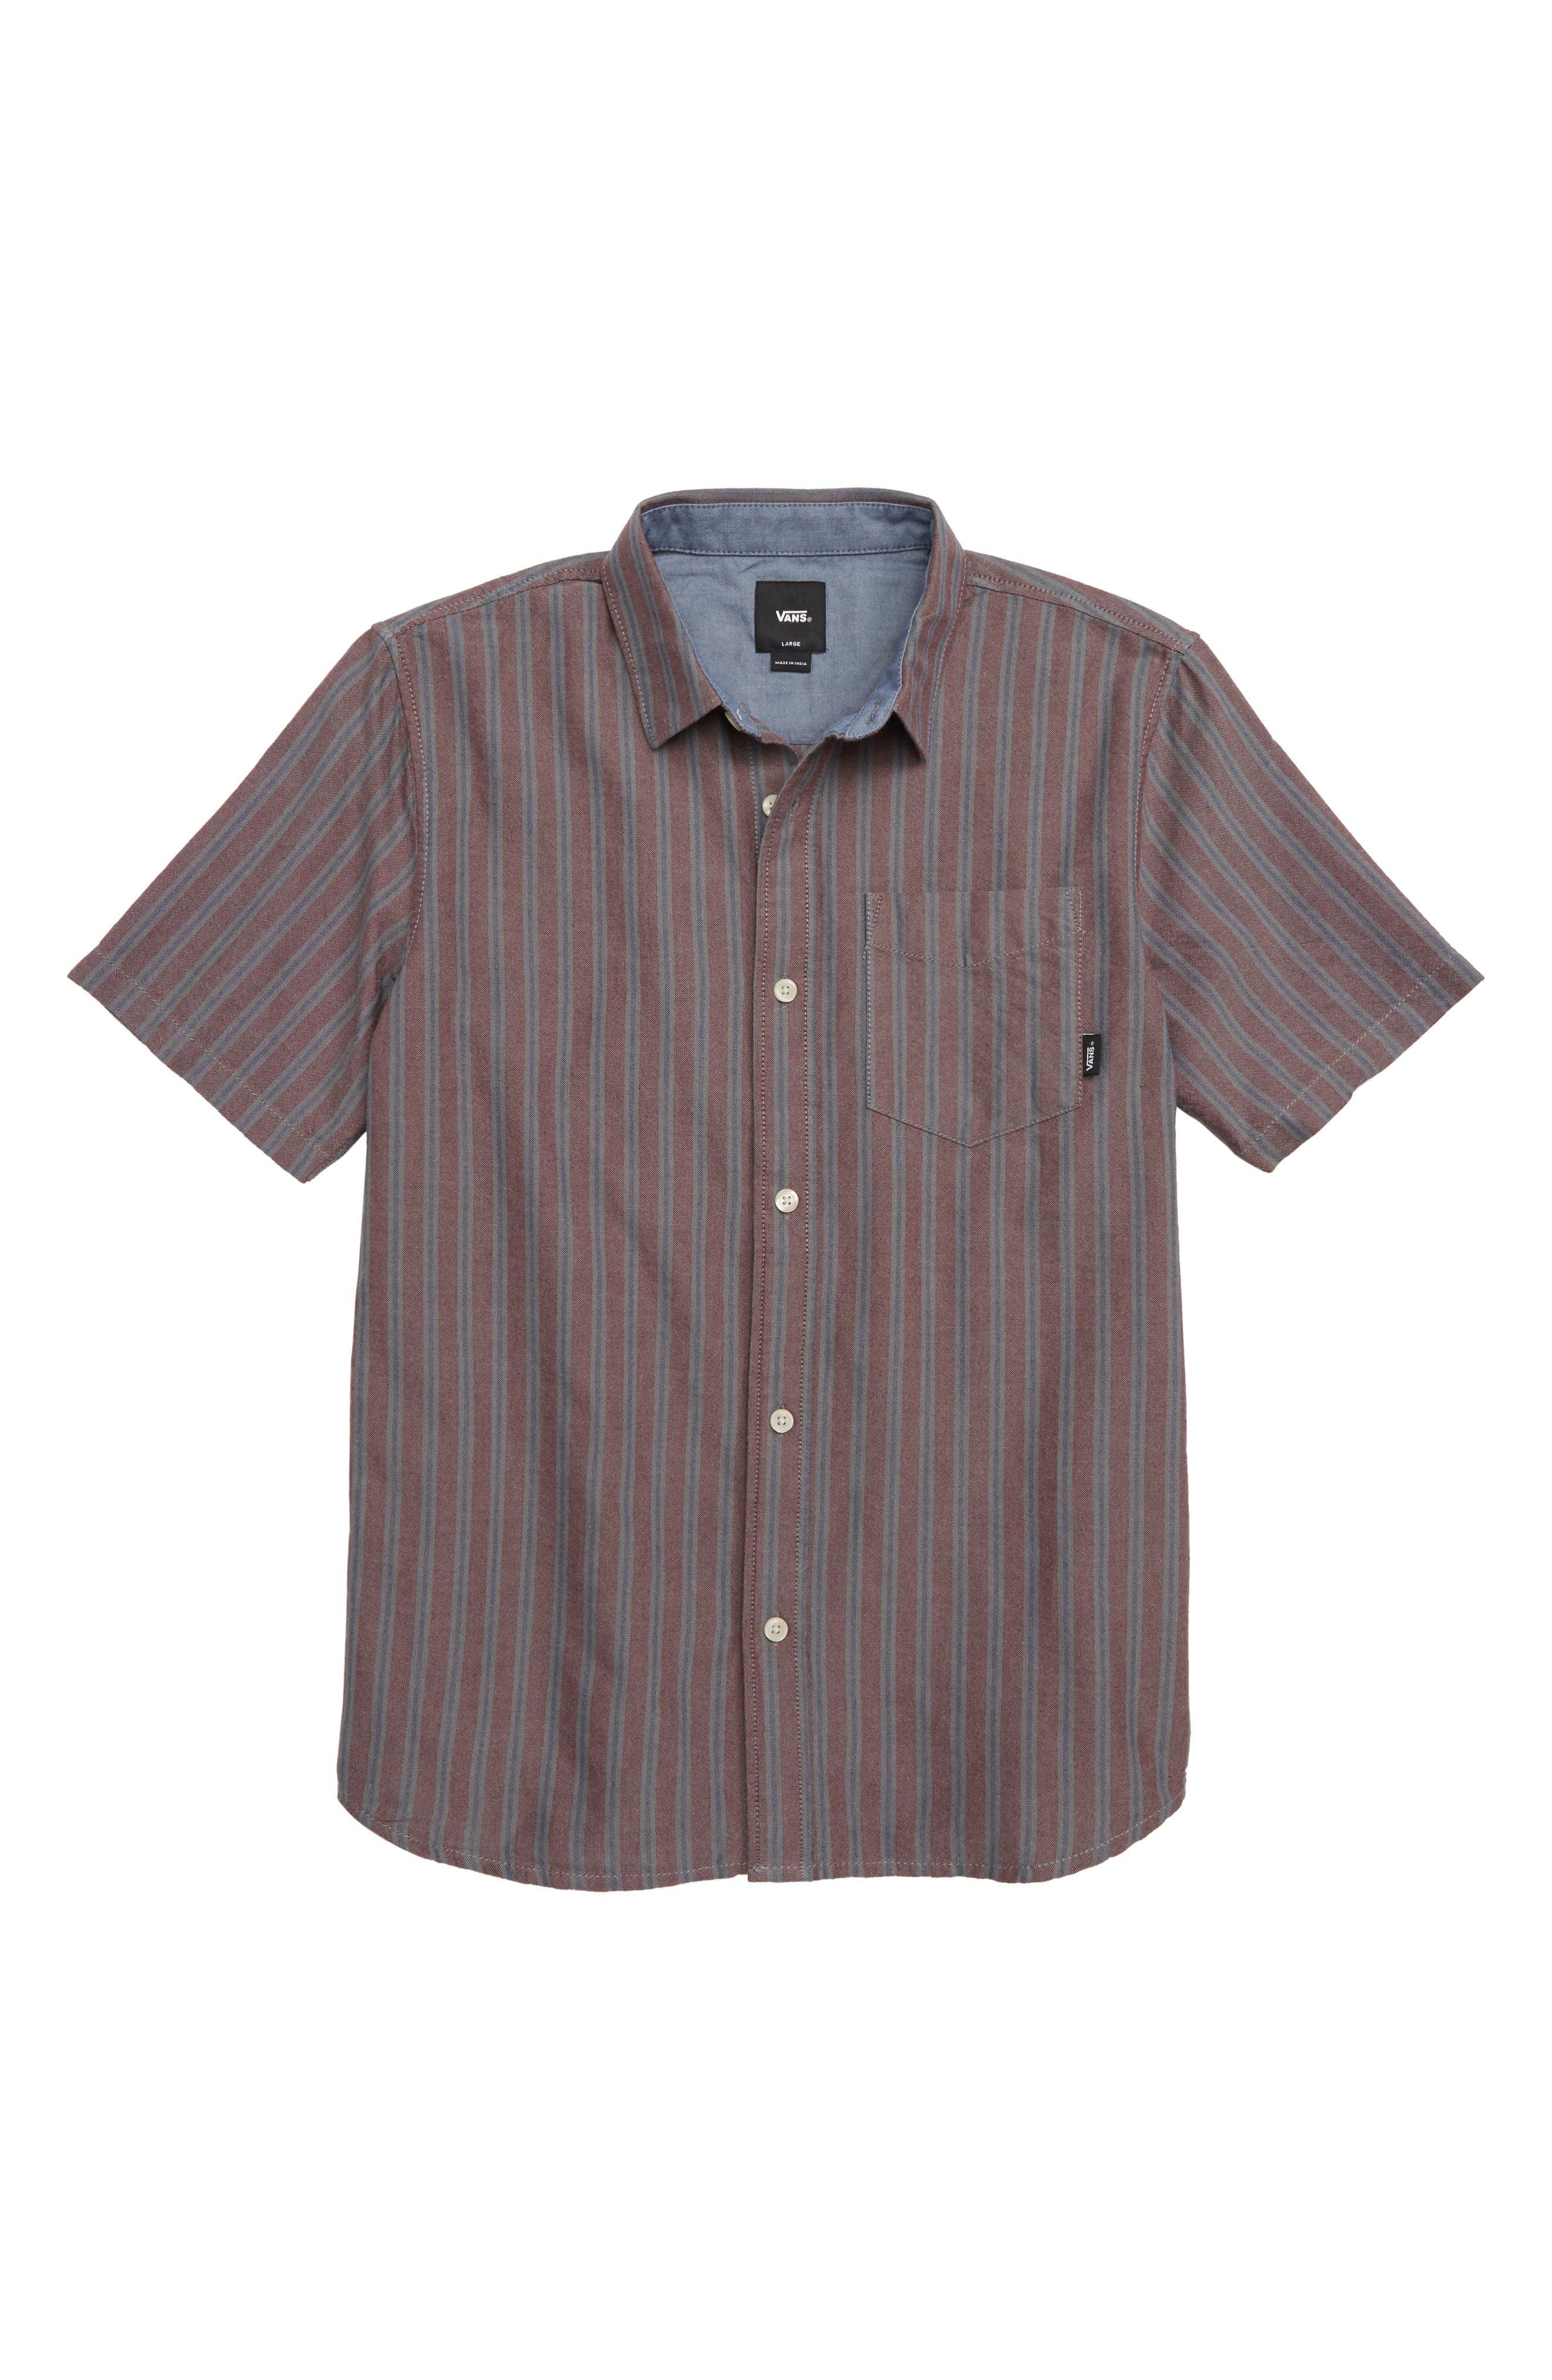 Houser Woven Shirt,                             Main thumbnail 1, color,                             PORT ROYALE STRIPE